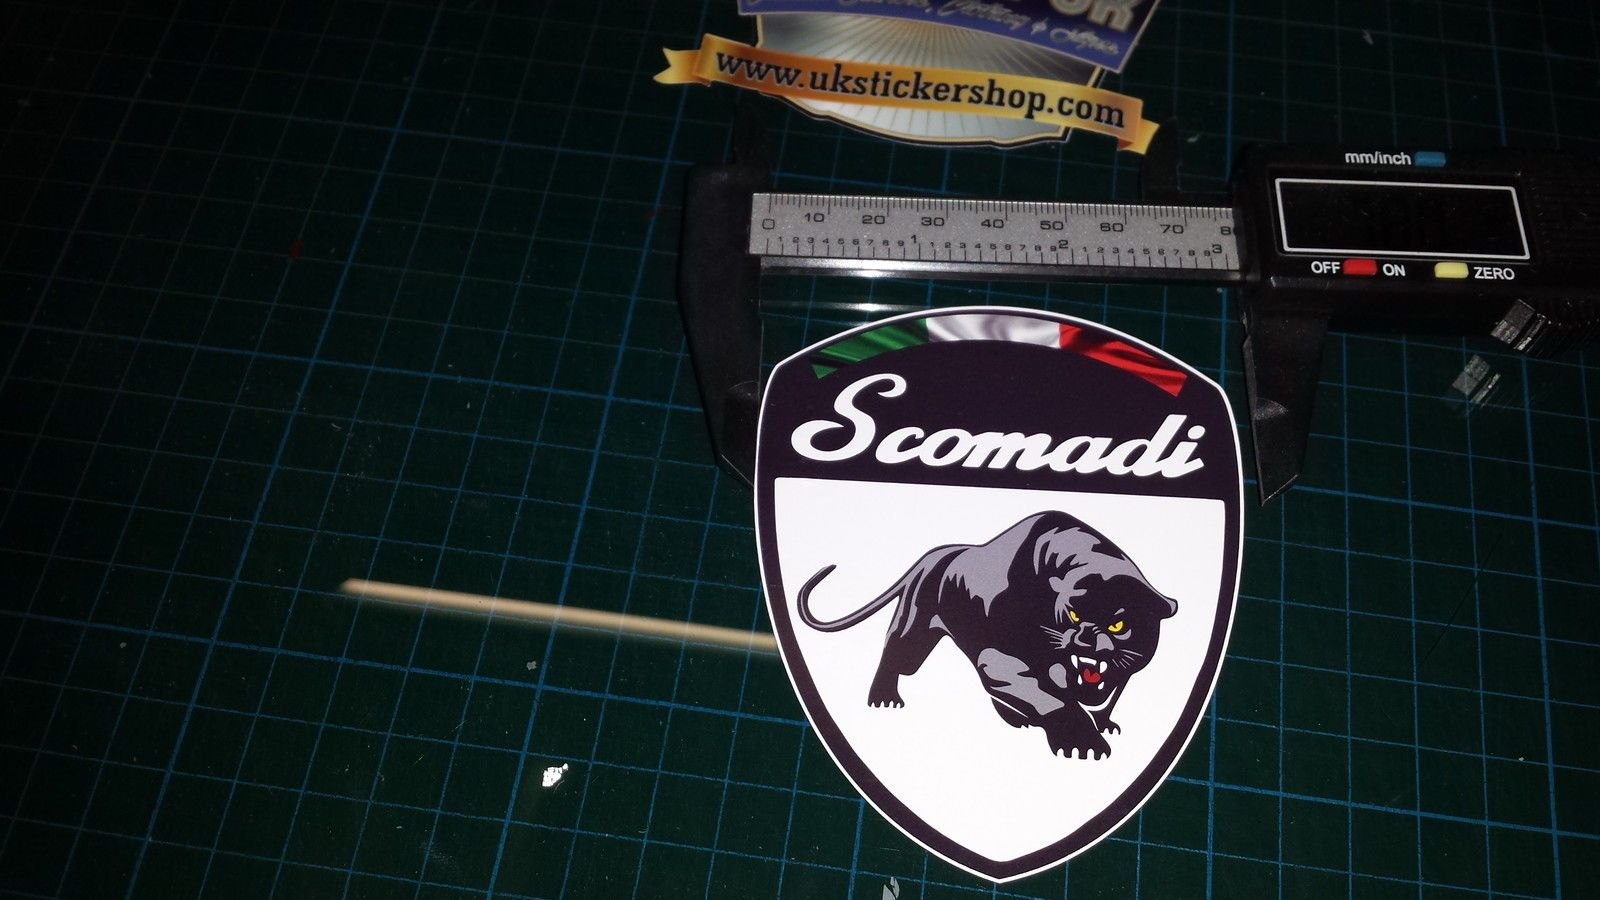 1x Scomadi Badge Logo Printed Decal Sticker Vespa